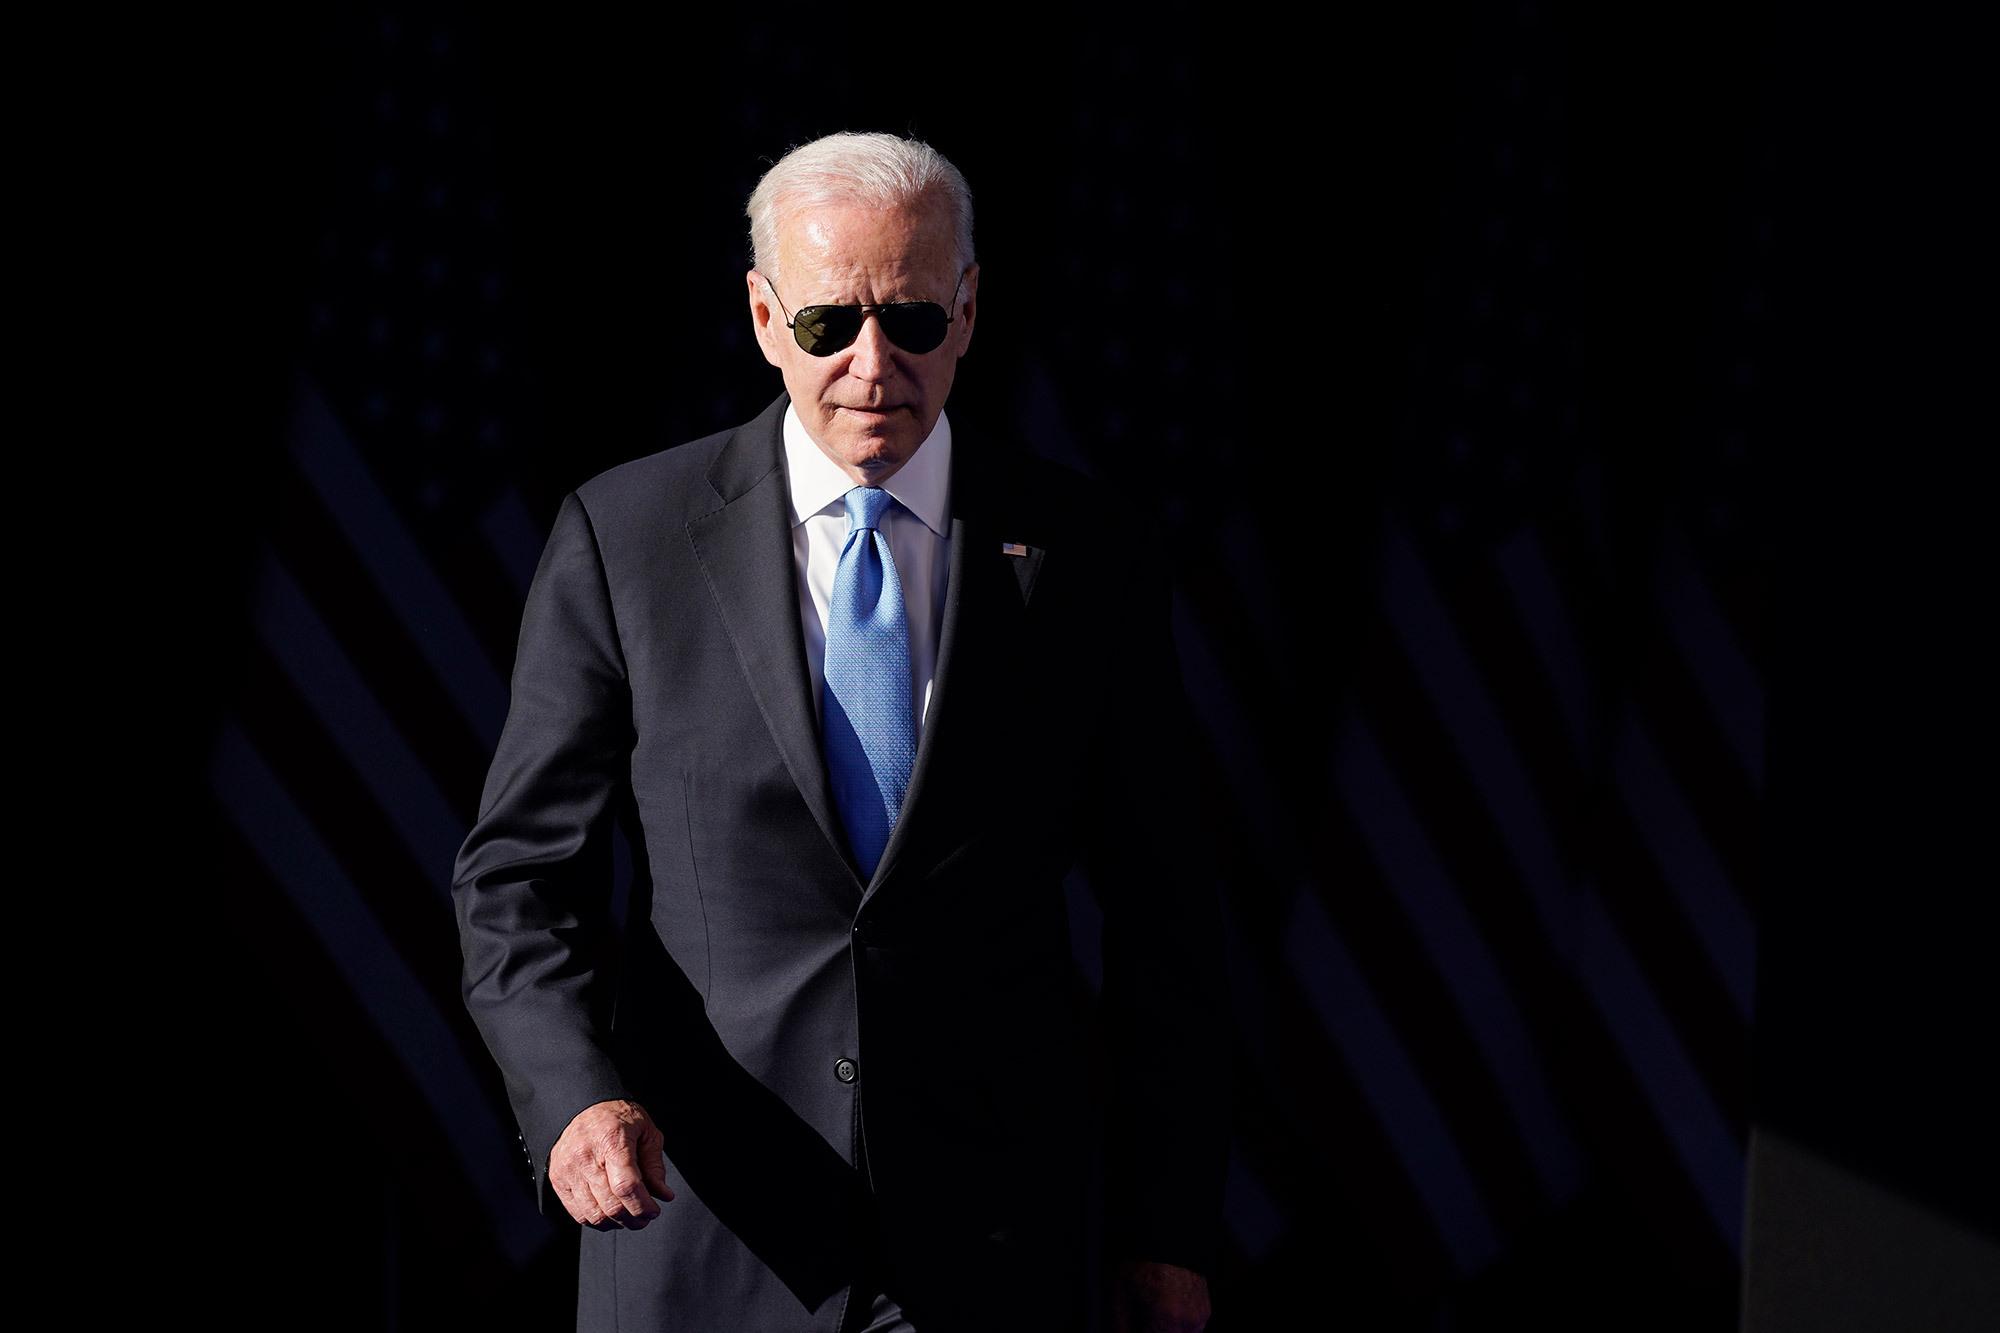 5 takeaways from the summit between Biden and Putin